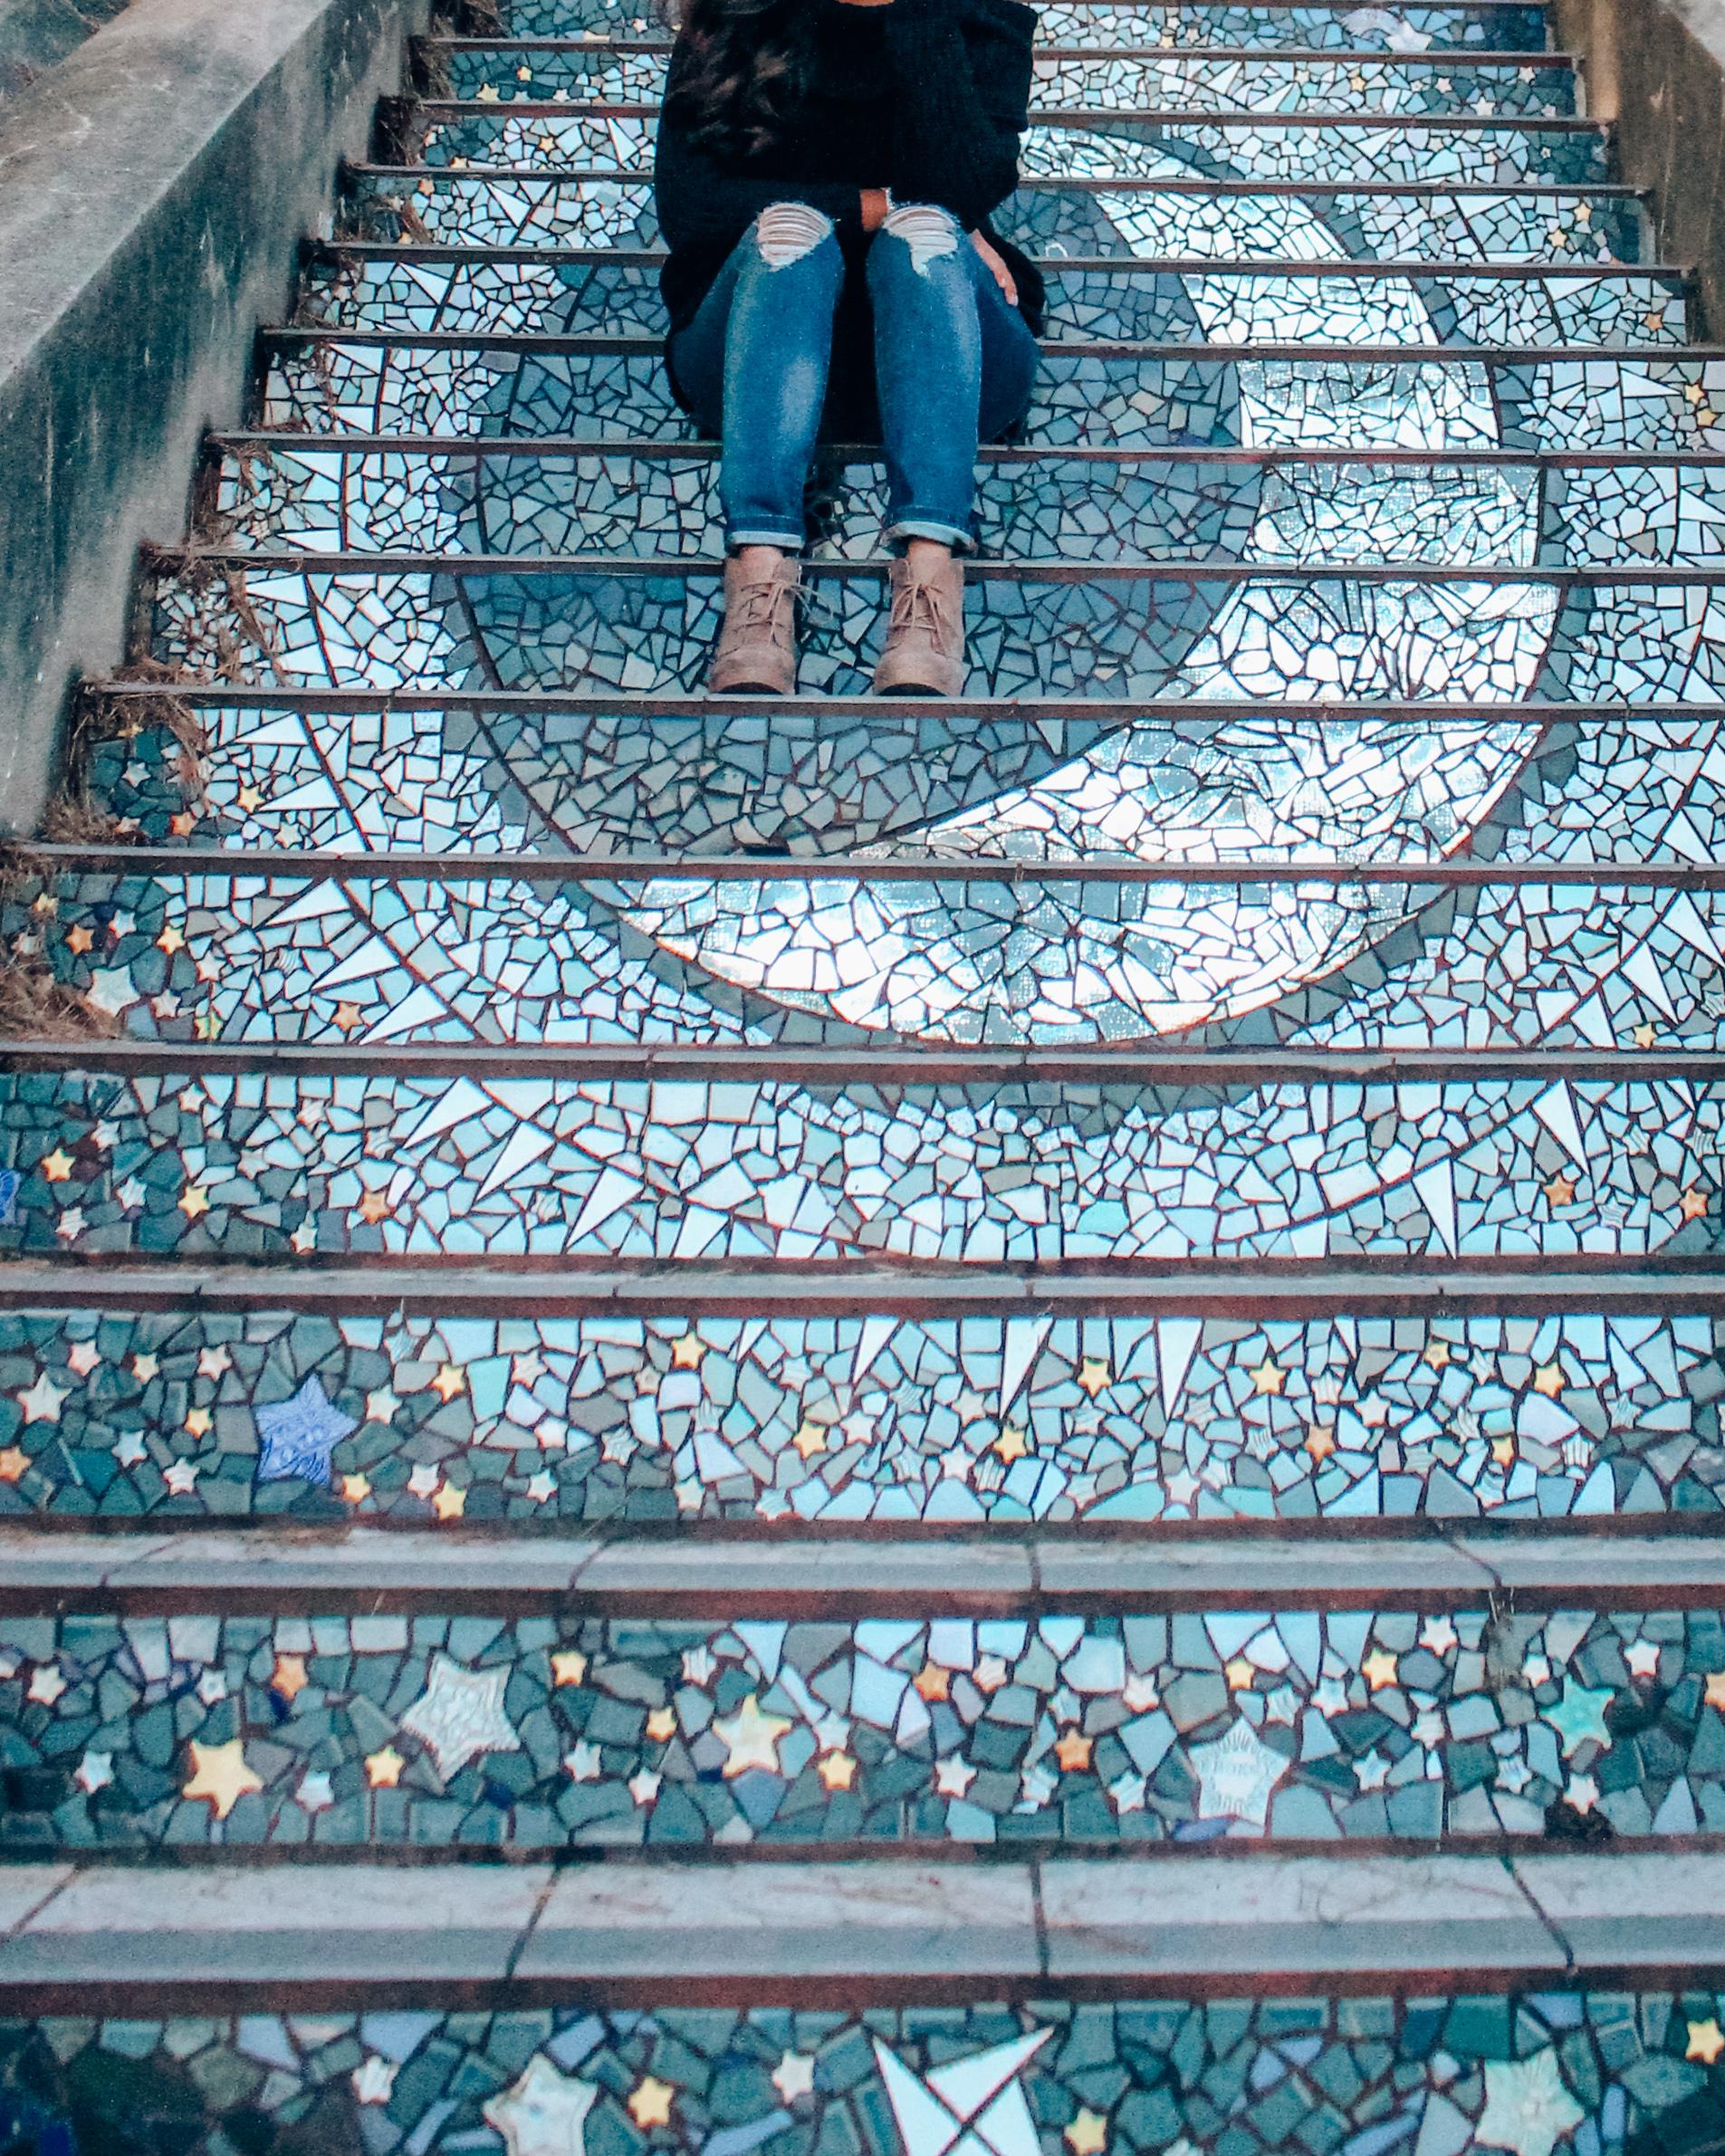 16th Avenue Tiled Steps, San Francisco, California